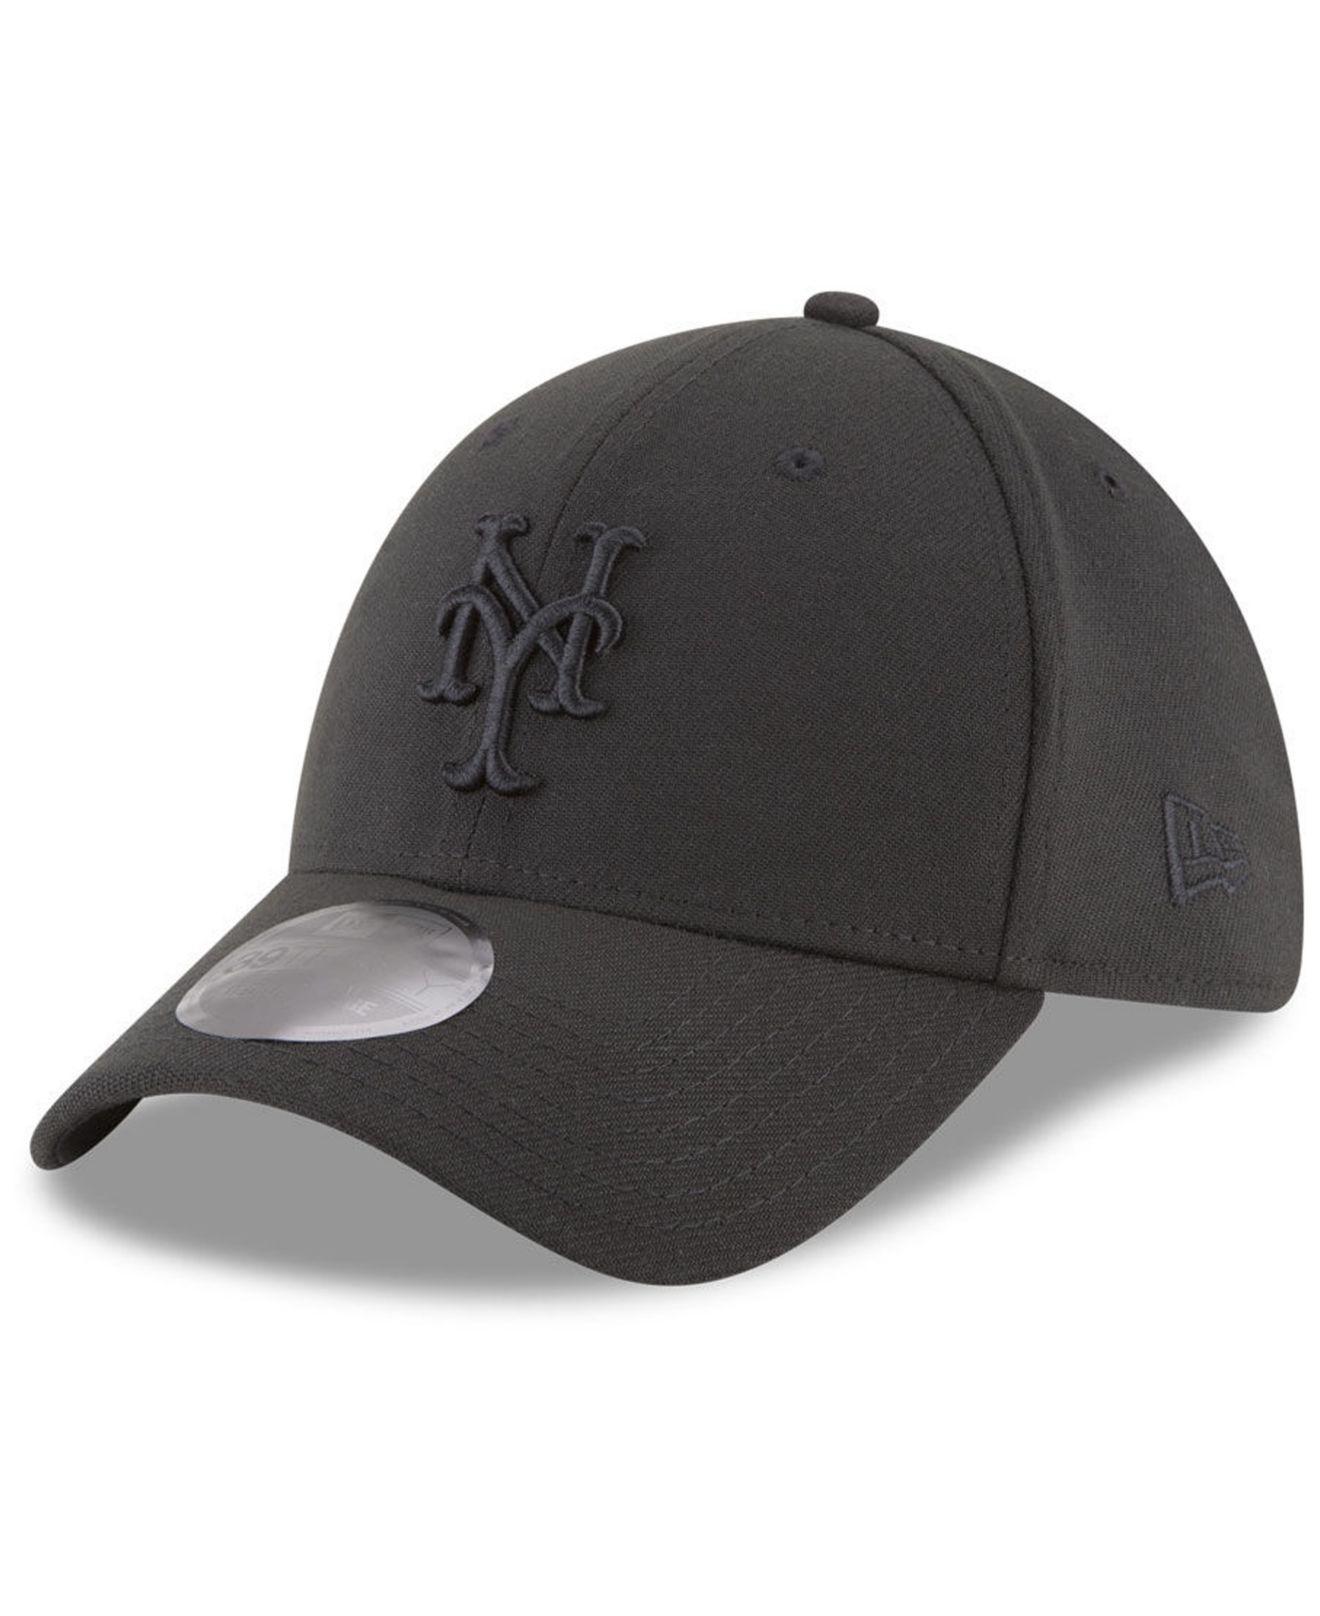 info for 98d53 1f93c KTZ - New York Mets Blackout 39thirty Cap for Men - Lyst. View fullscreen